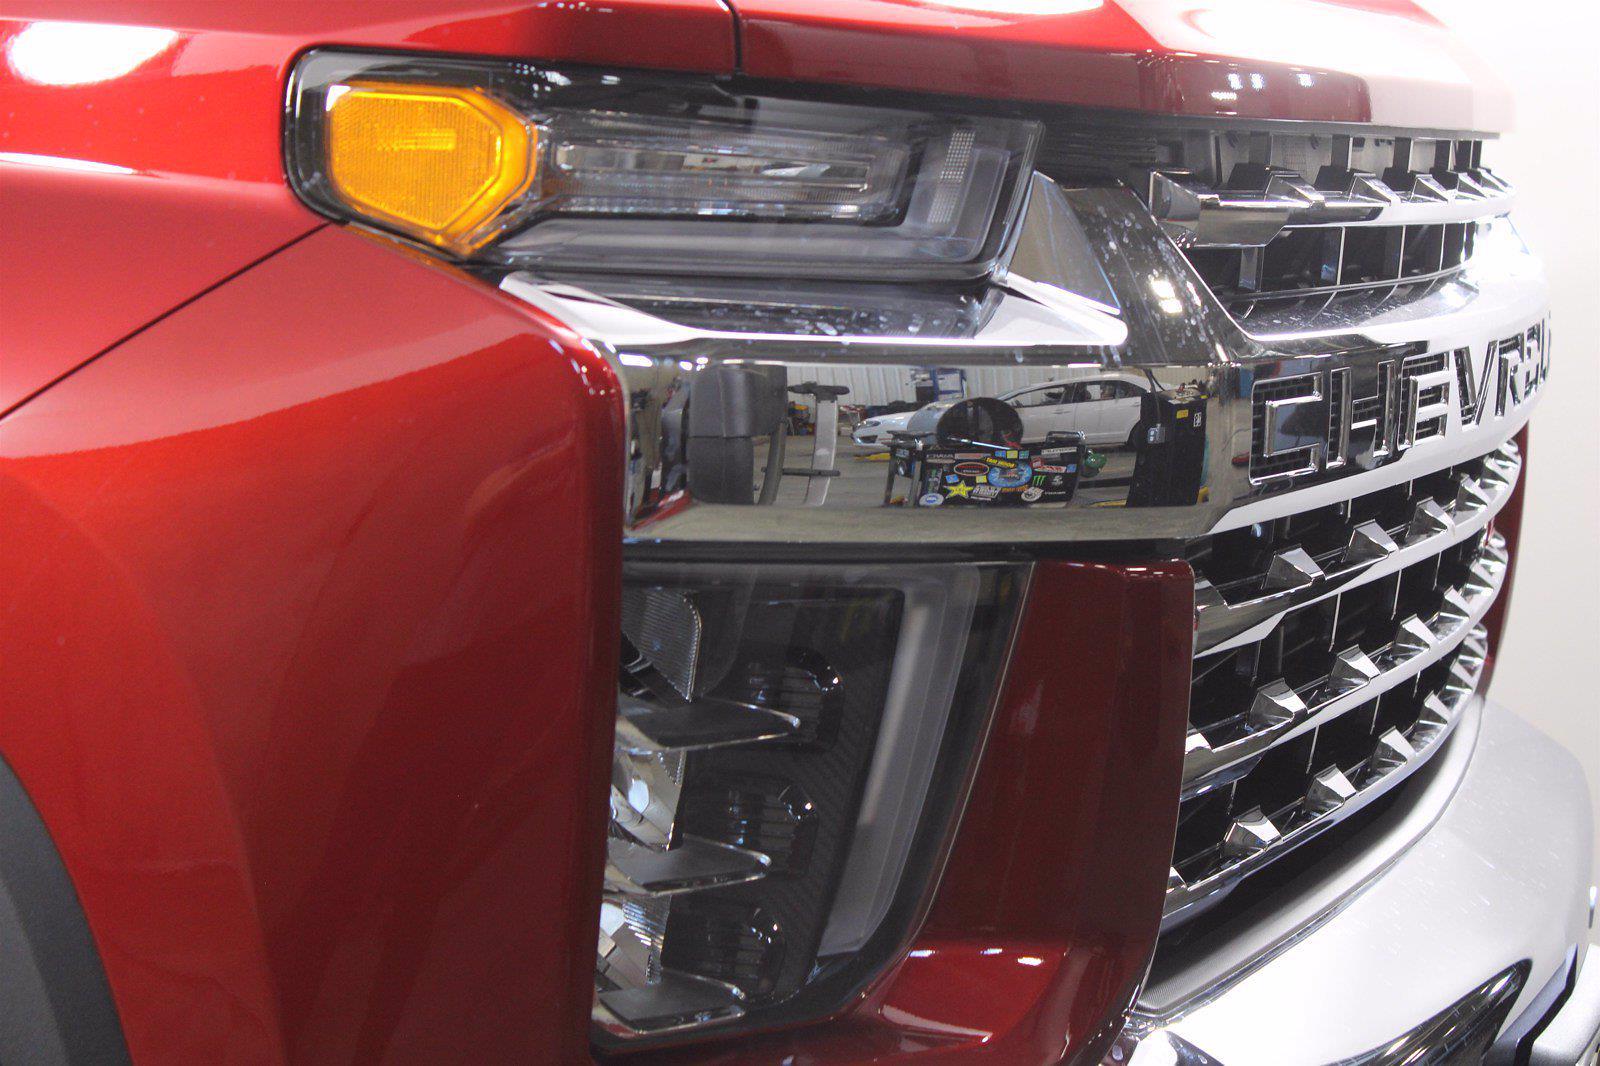 2021 Chevrolet Silverado 3500 Crew Cab 4x4, Pickup #D111089 - photo 5